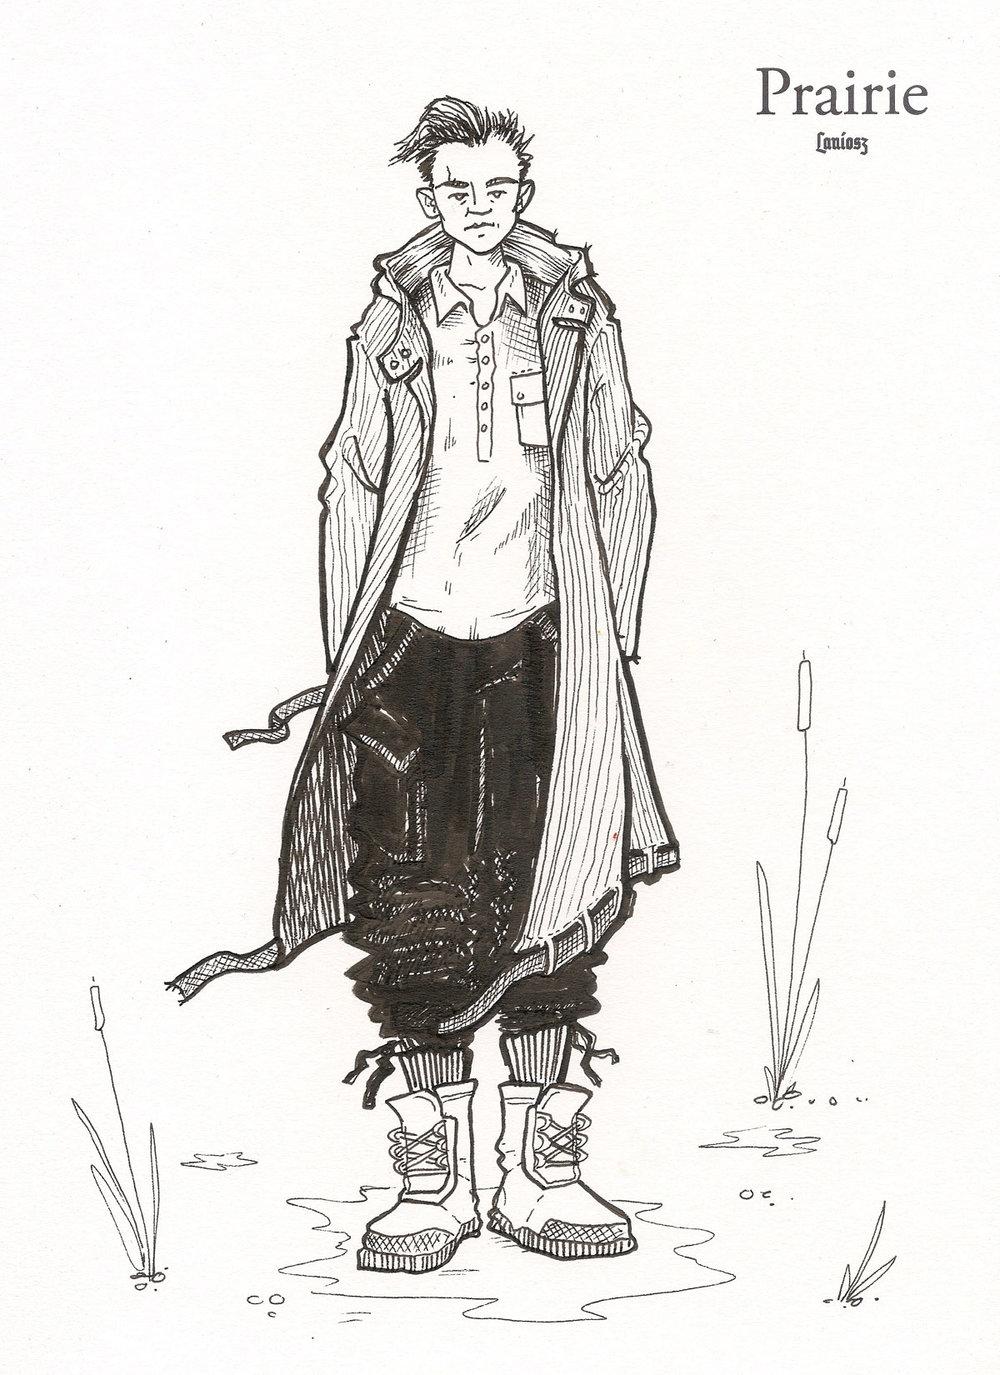 laniosz-prairie-sketch-3.jpg